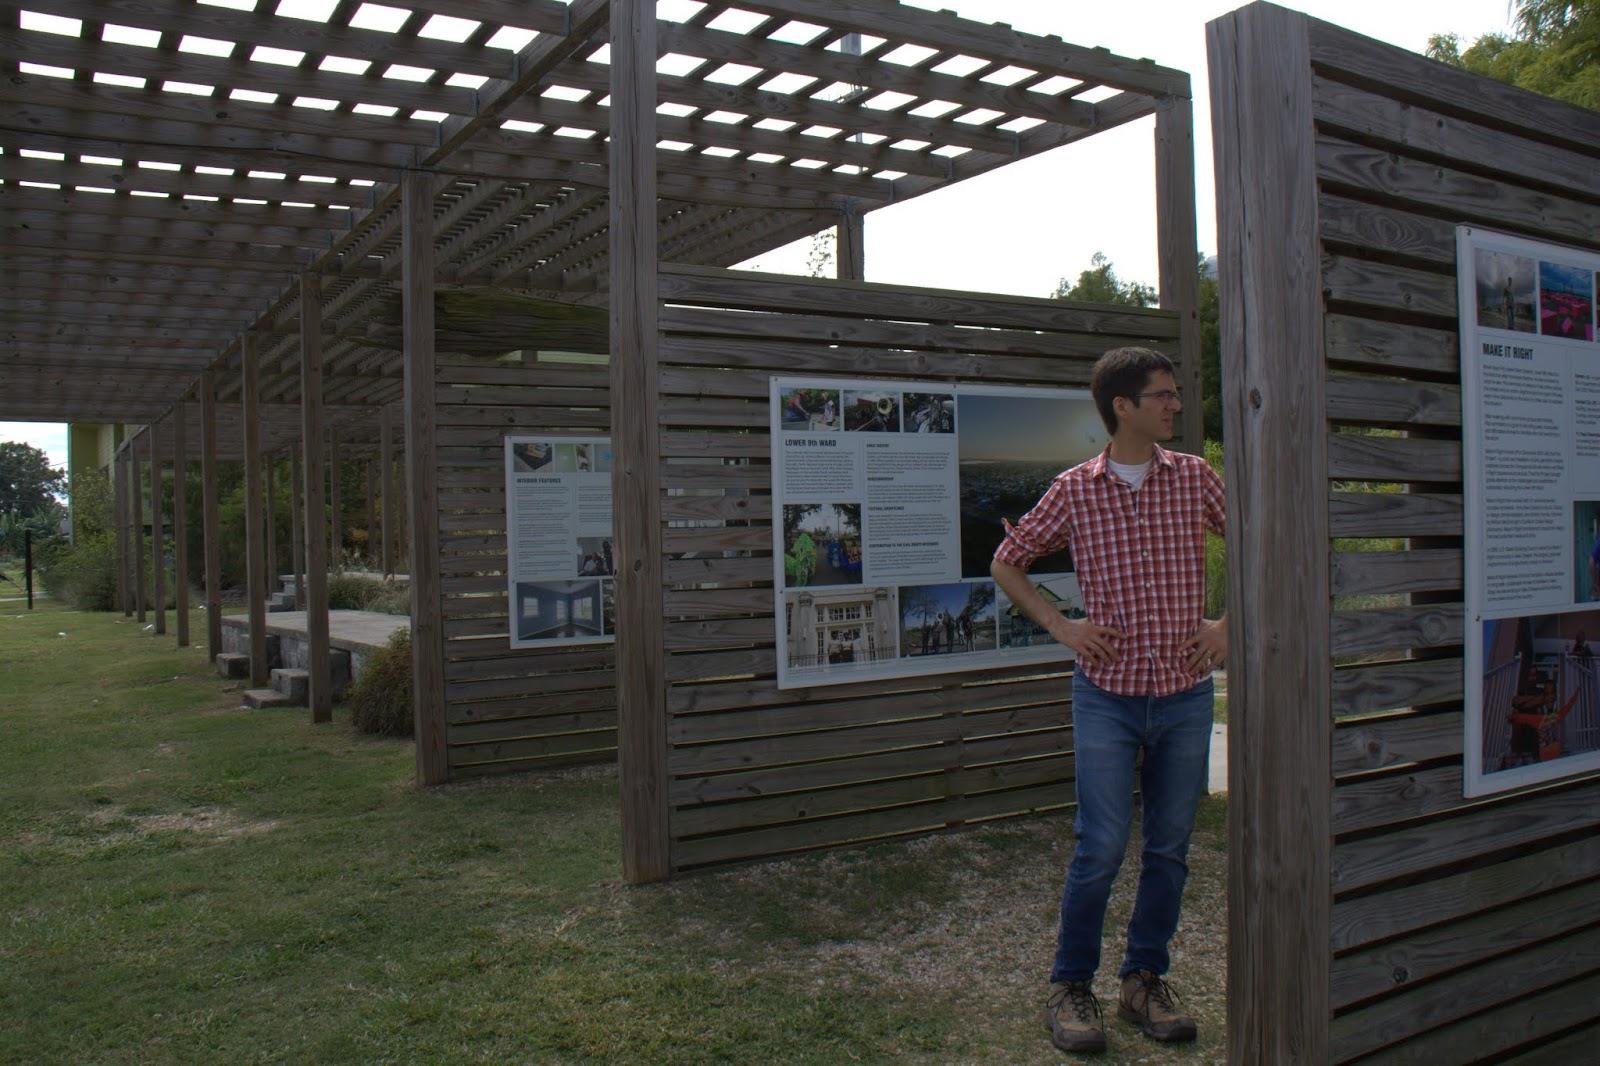 The Make-It-Right pavilion